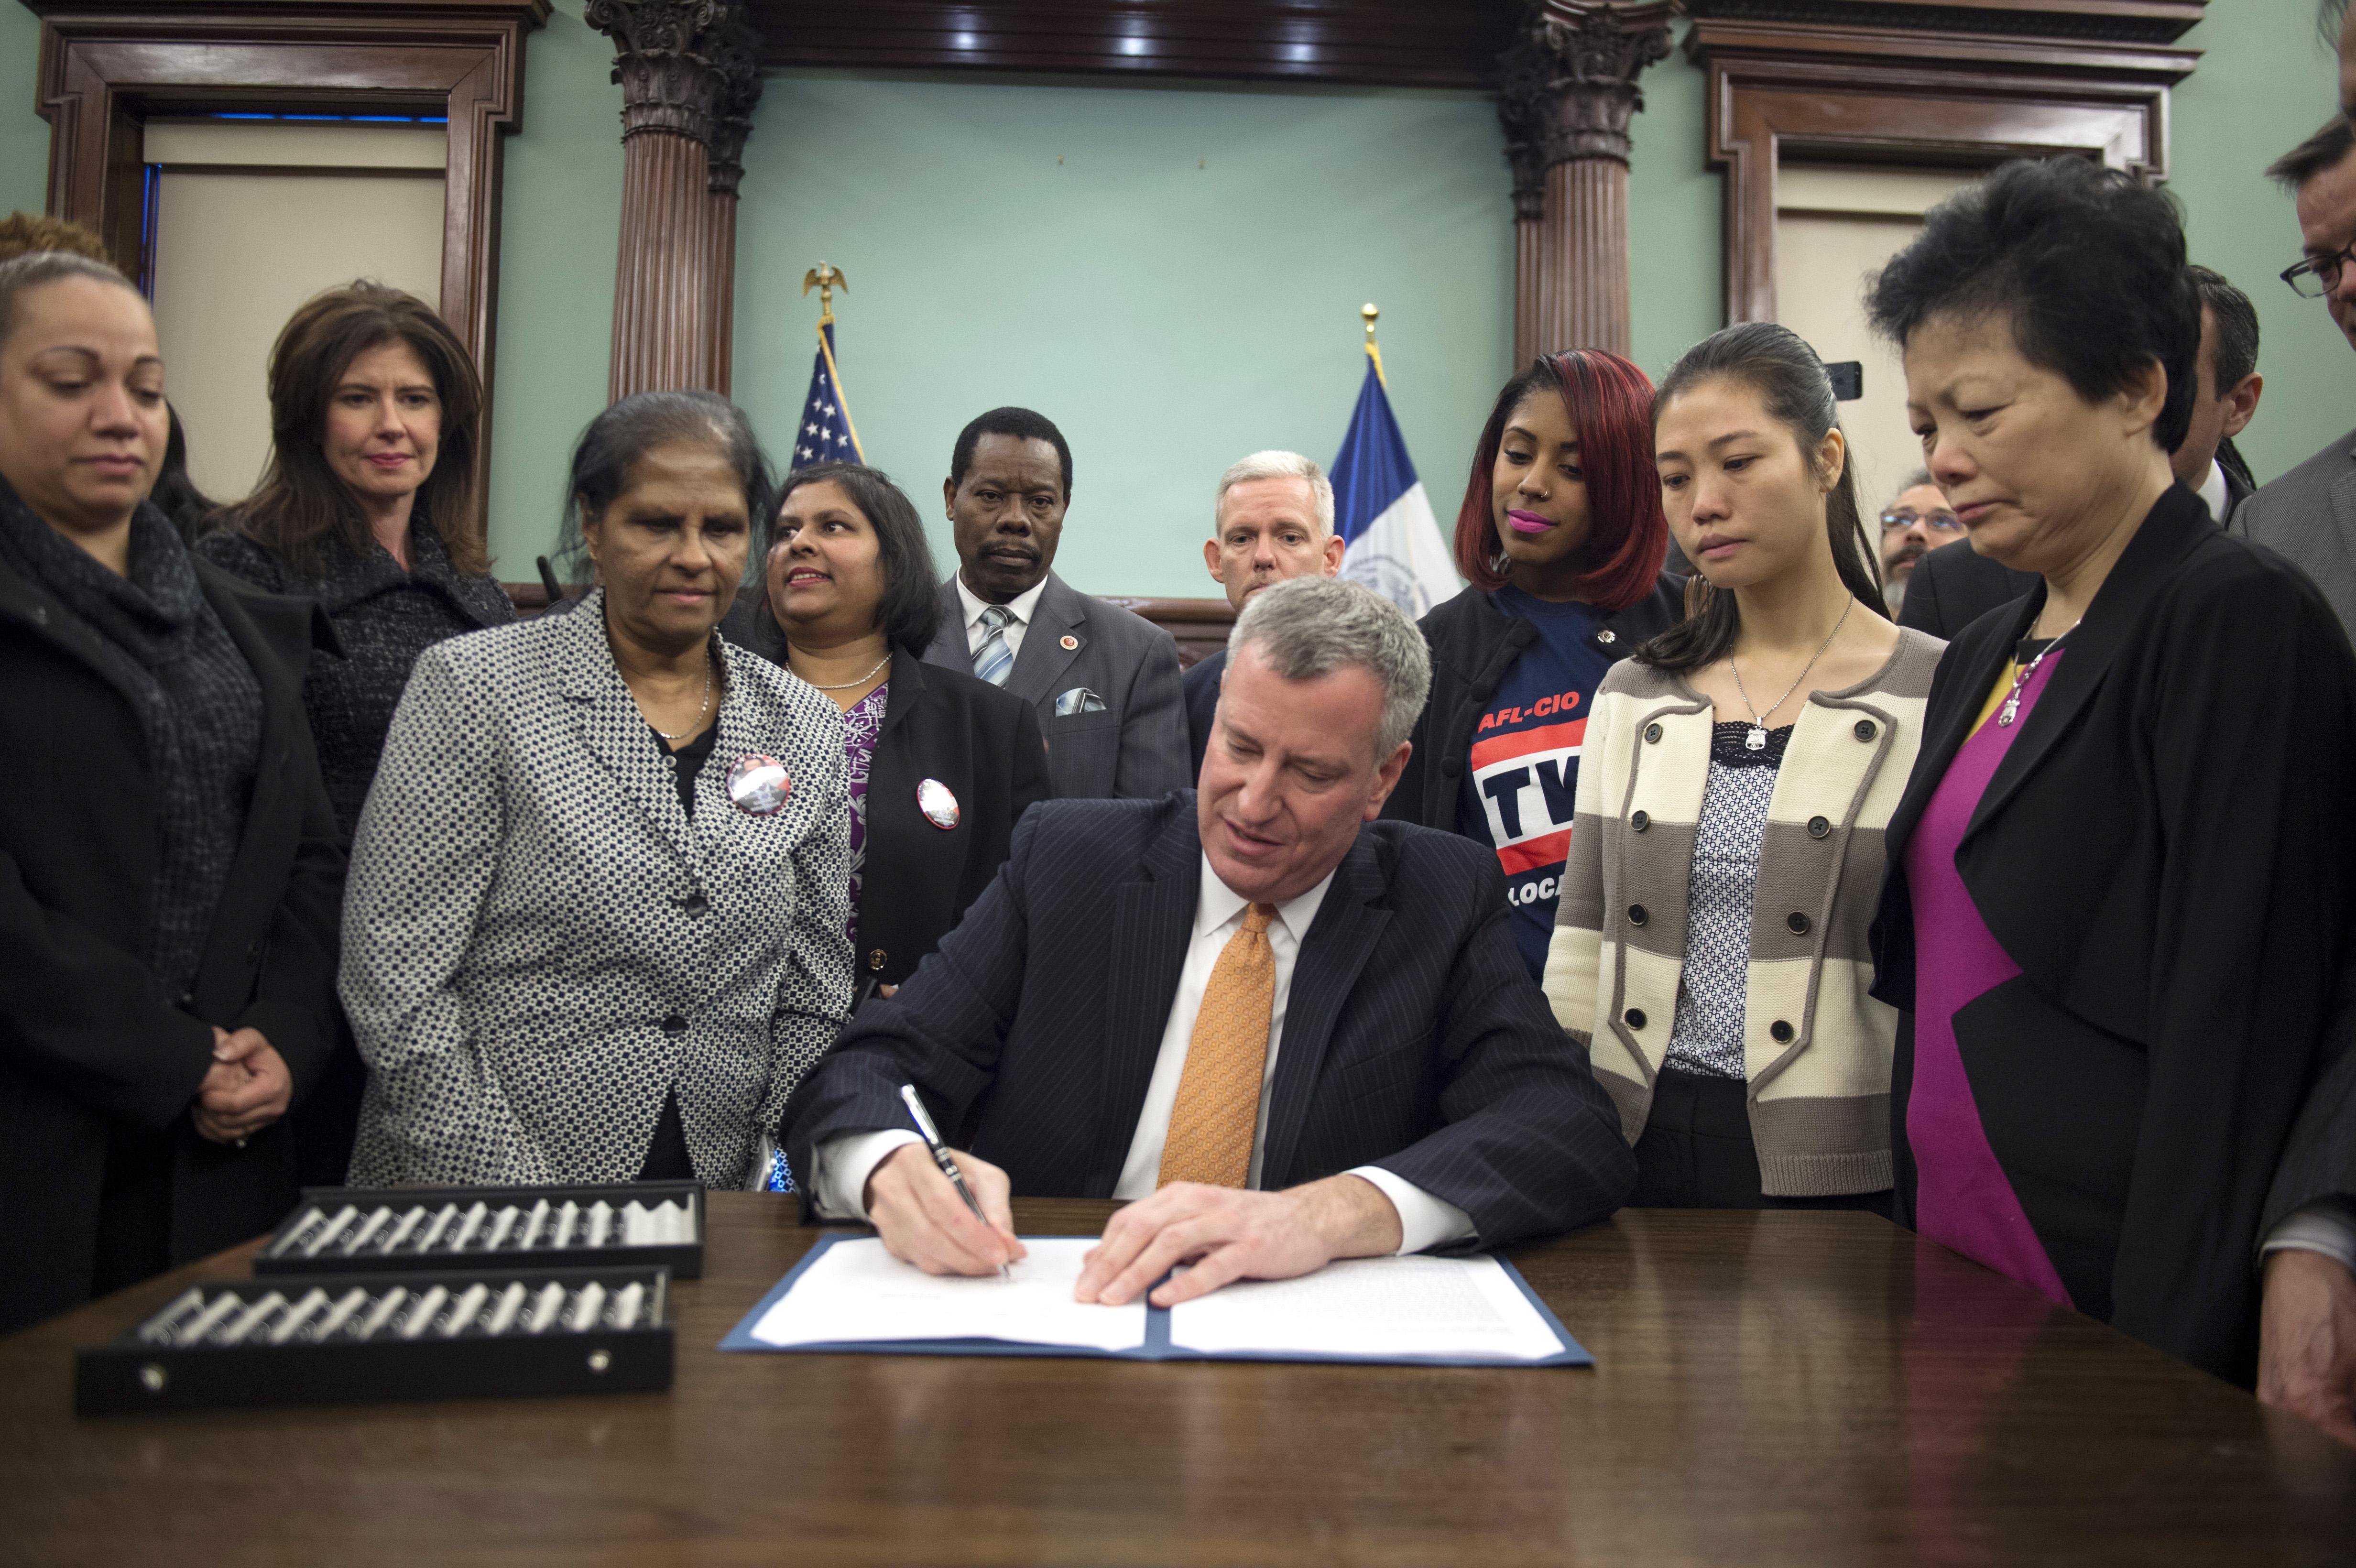 Mayor Bill de Blasio signs a law to name streets after Rafael Ramos and Wenjian Liu. (Demetrius Freeman/Mayoral Photography Office)